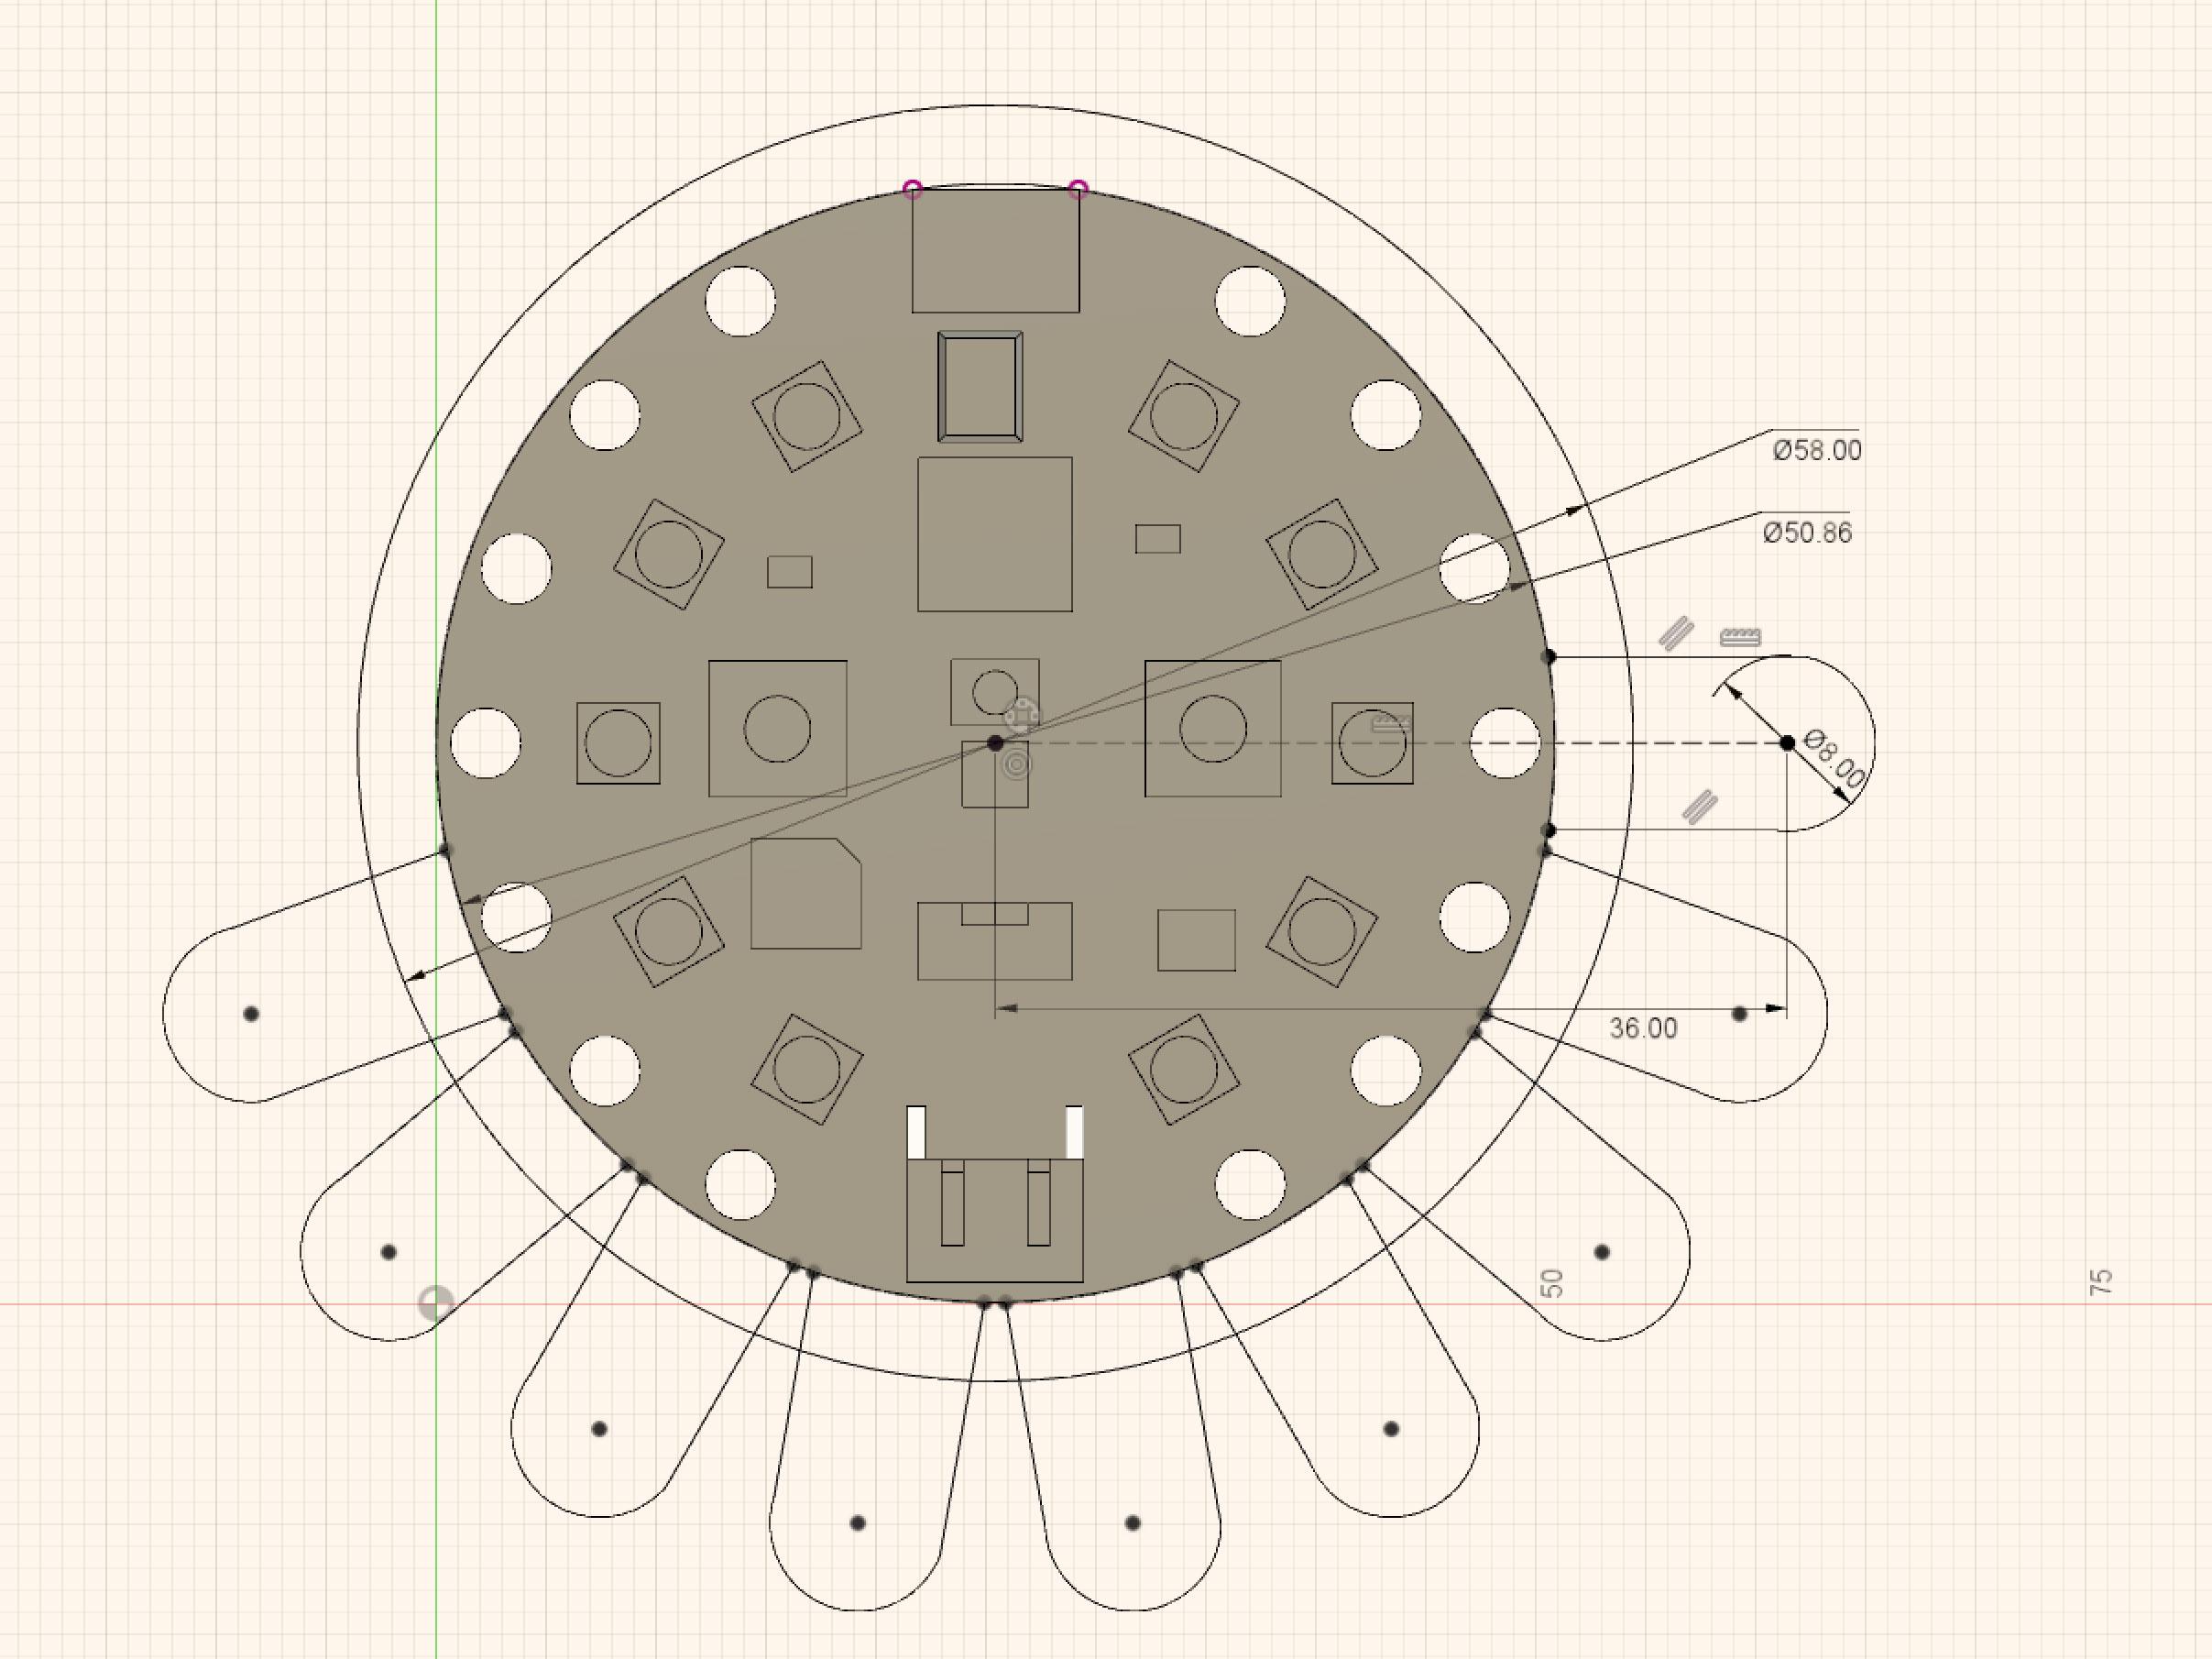 3d_printing_pcb-sketch-f360.jpg